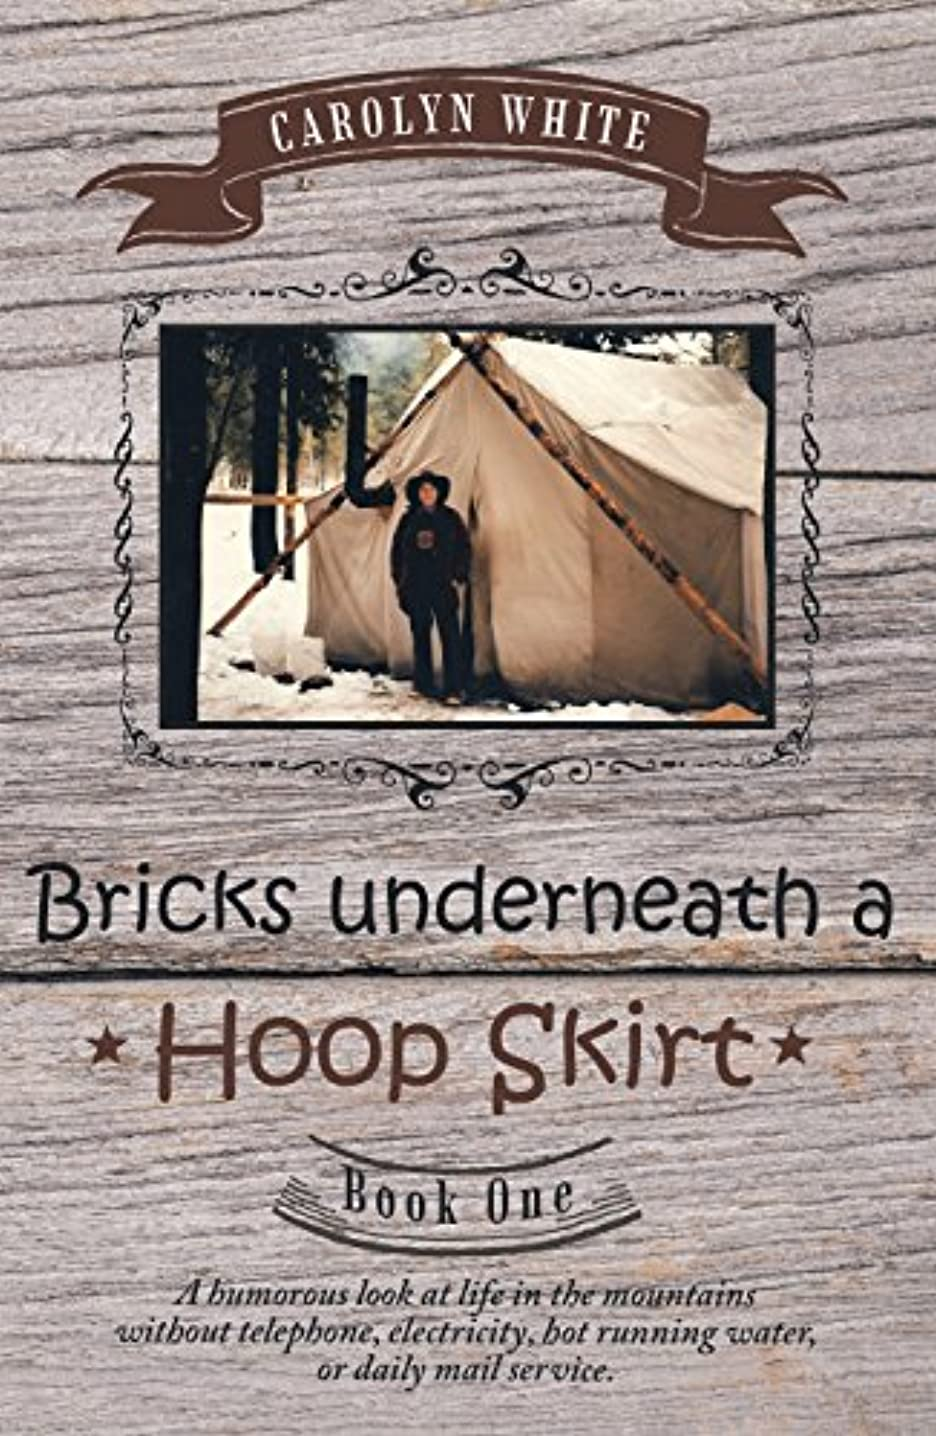 Bricks Underneath a Hoop Skirt: Book One